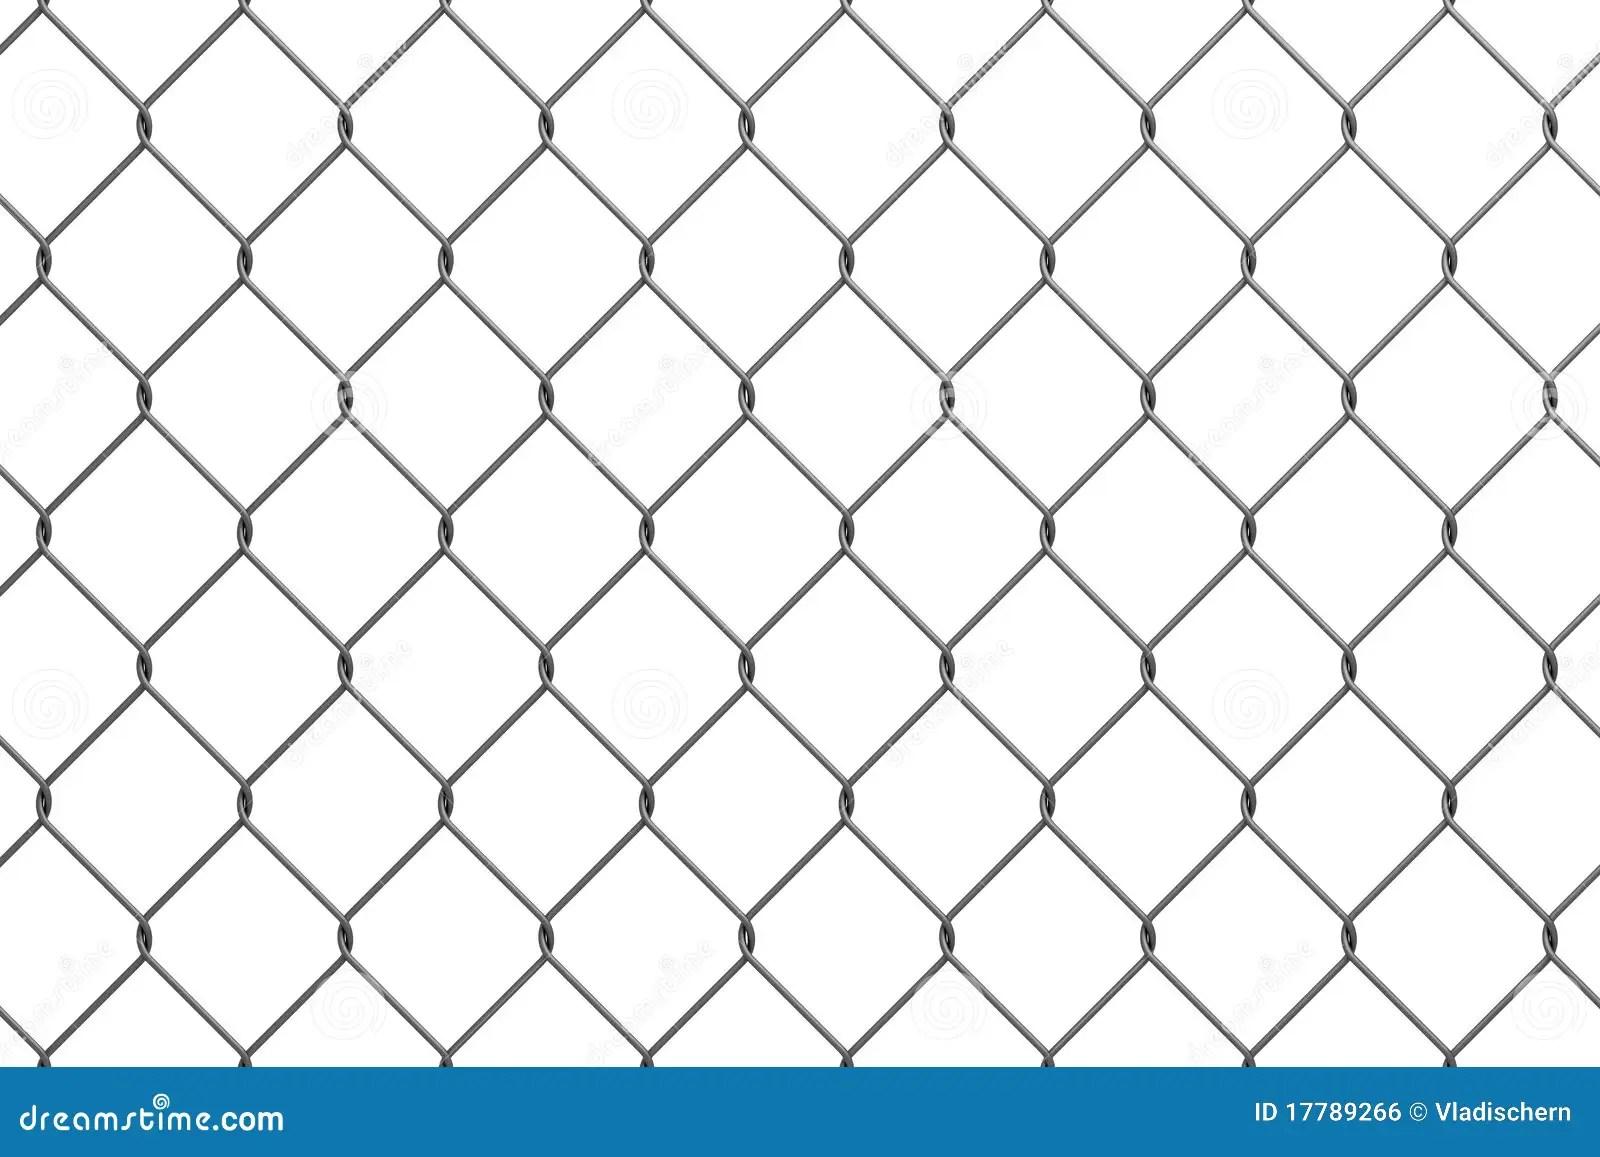 Iron wire fence stock illustration. Image of metallic